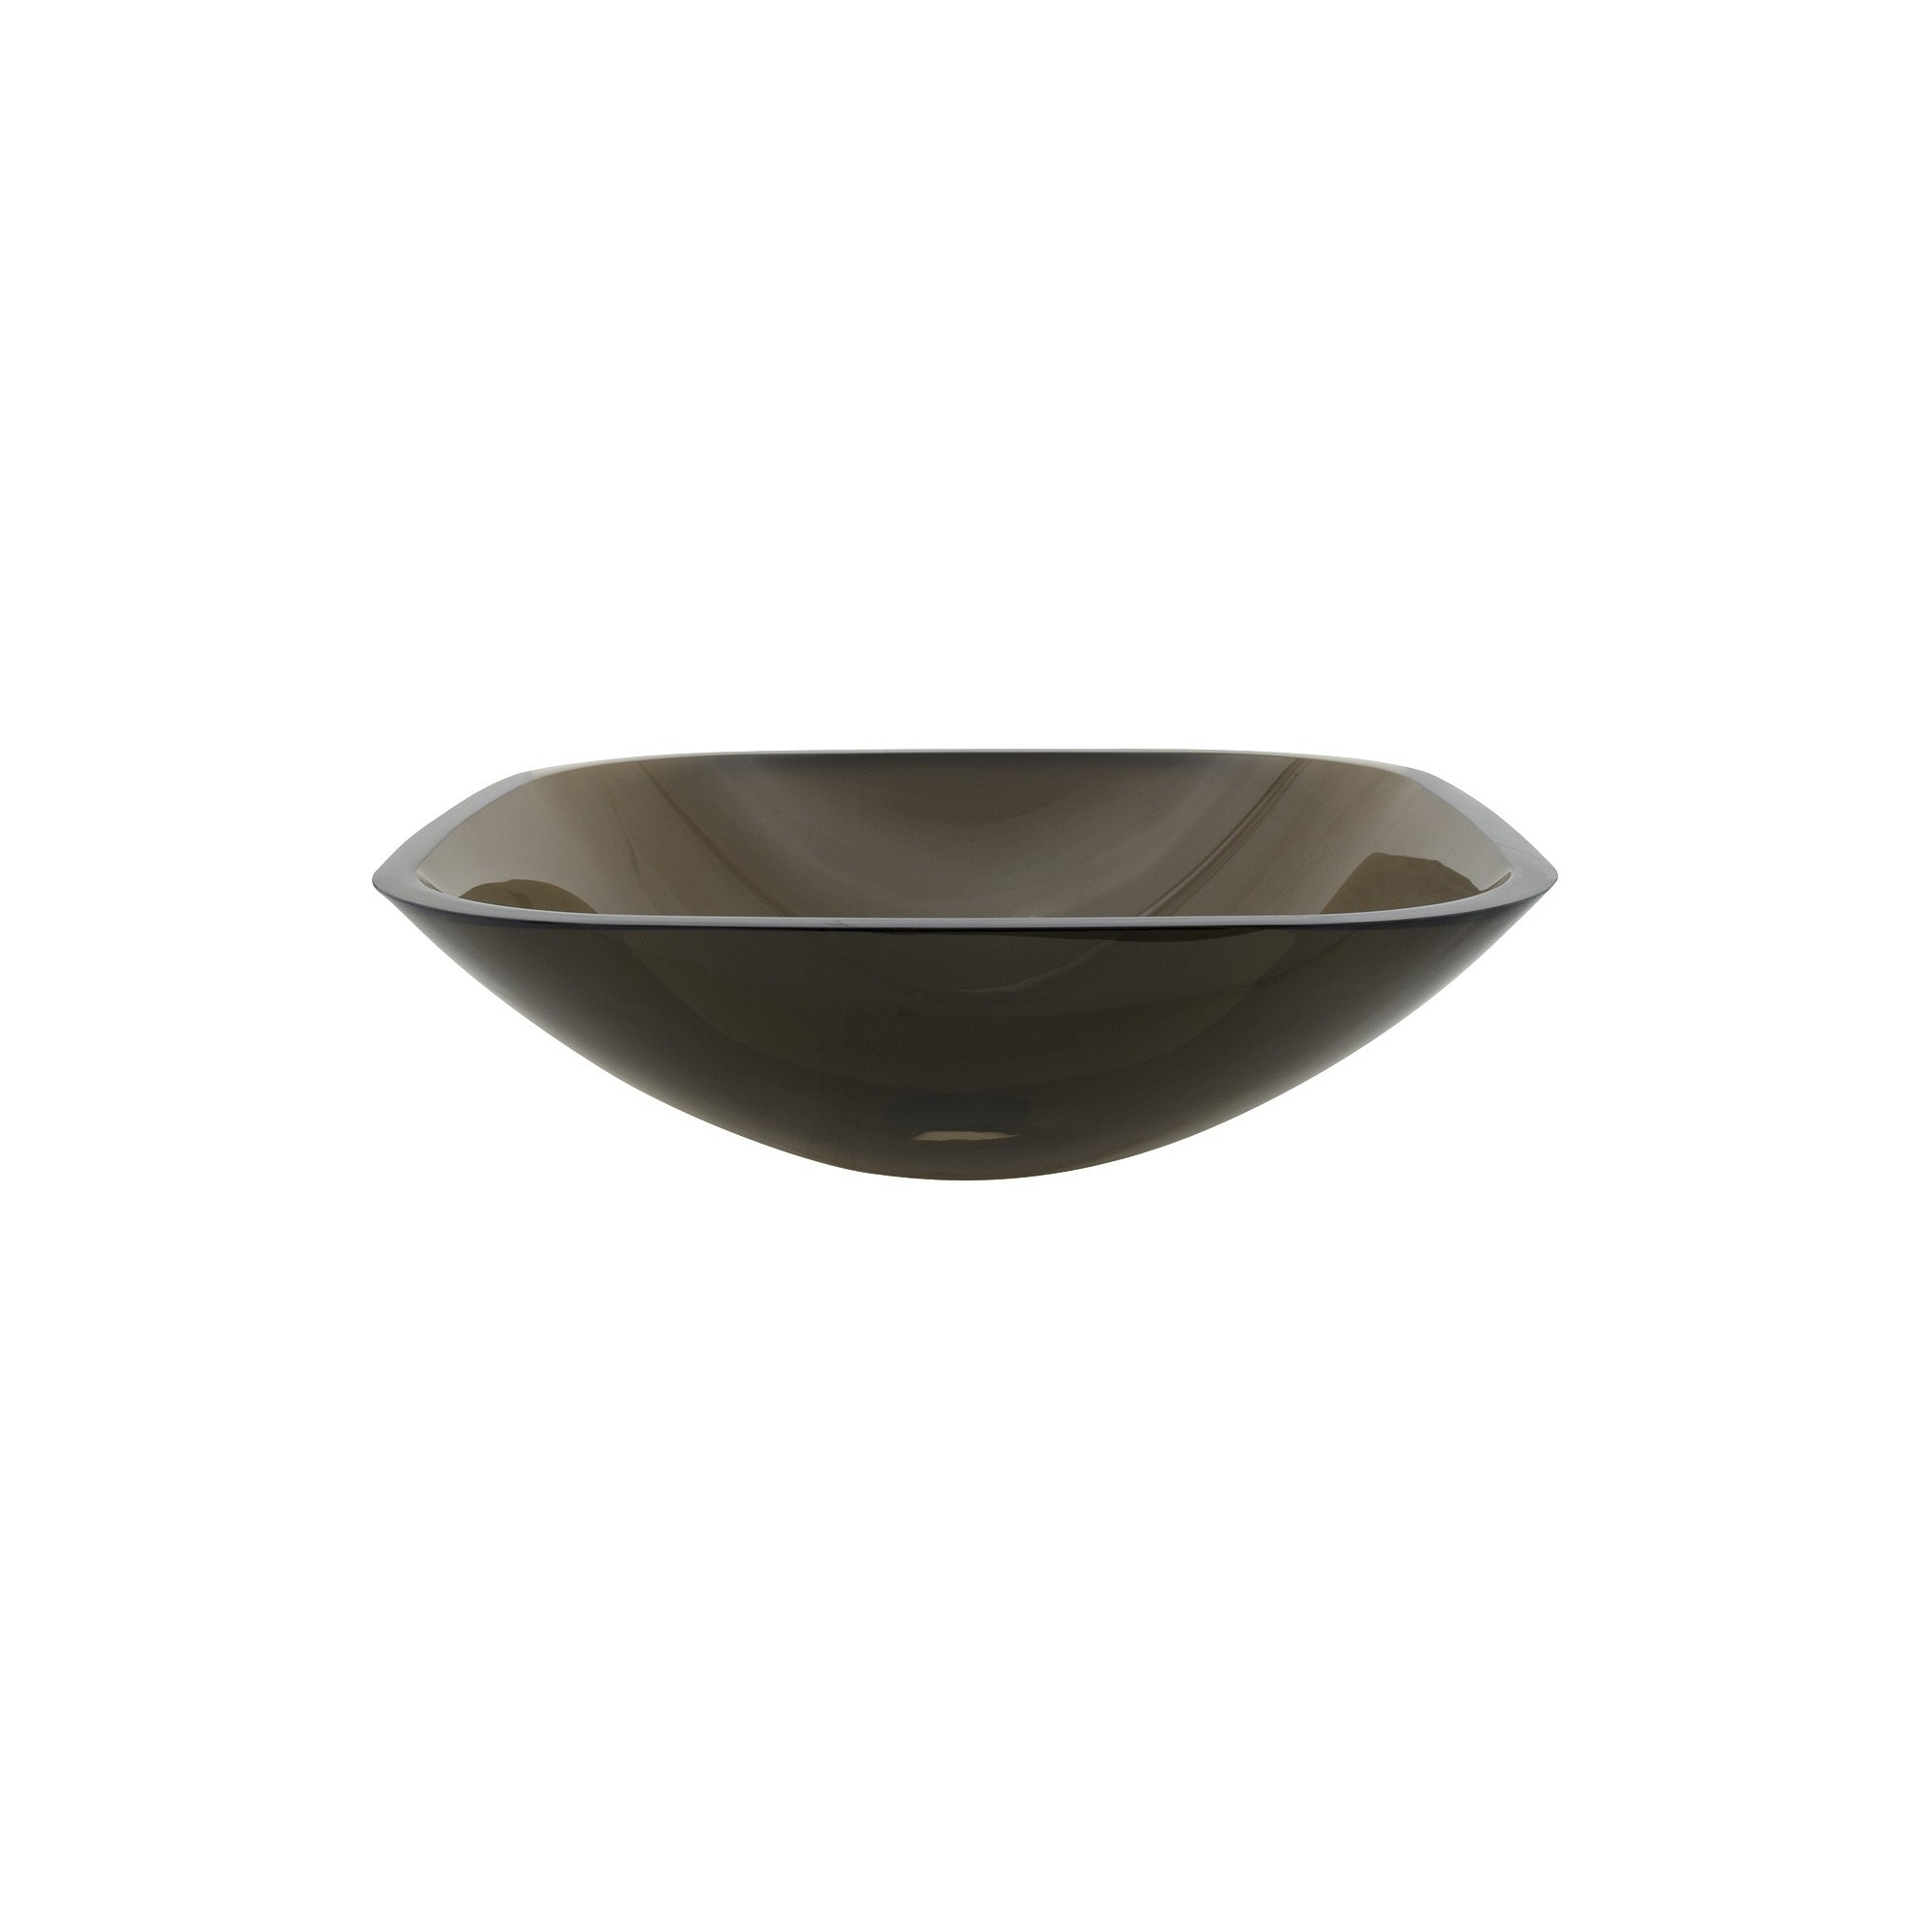 Tempered Glass Square Bathroom Vessel Sink Amber Bronze - Kingston Brass